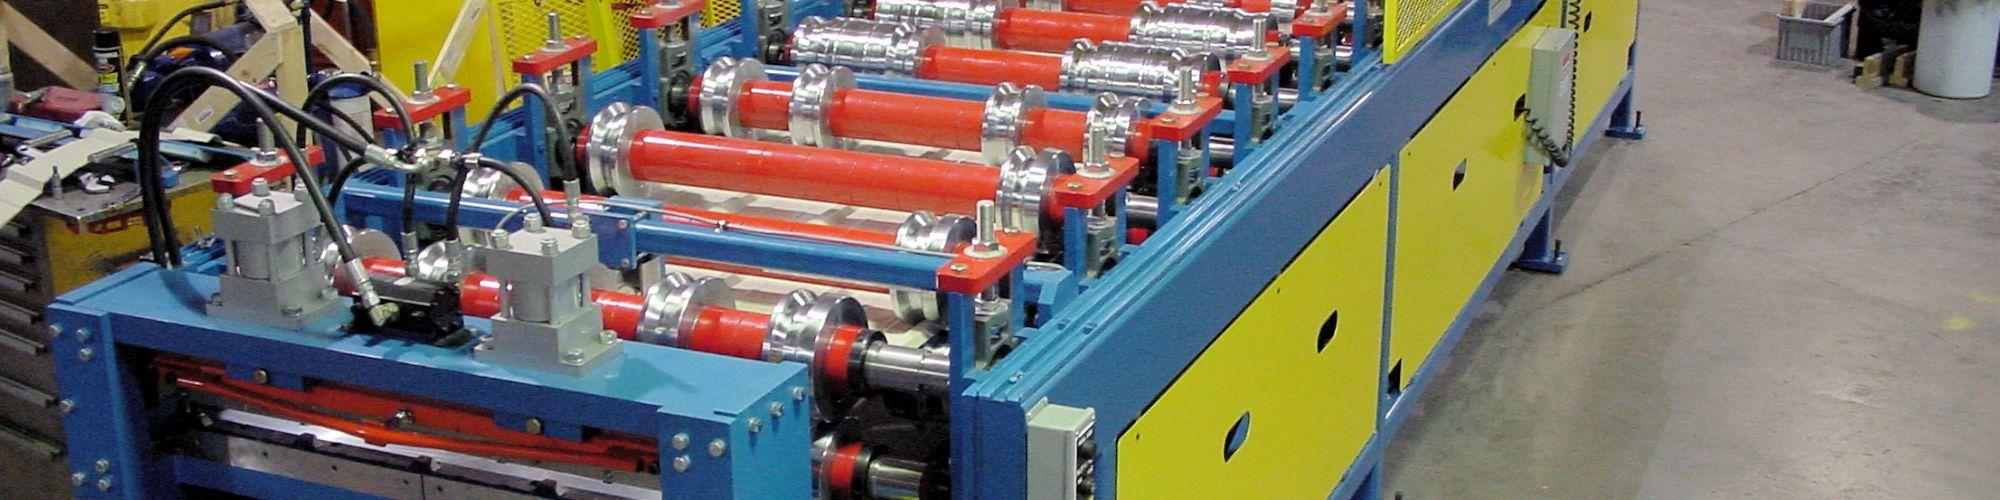 machine-mfg-rollformer